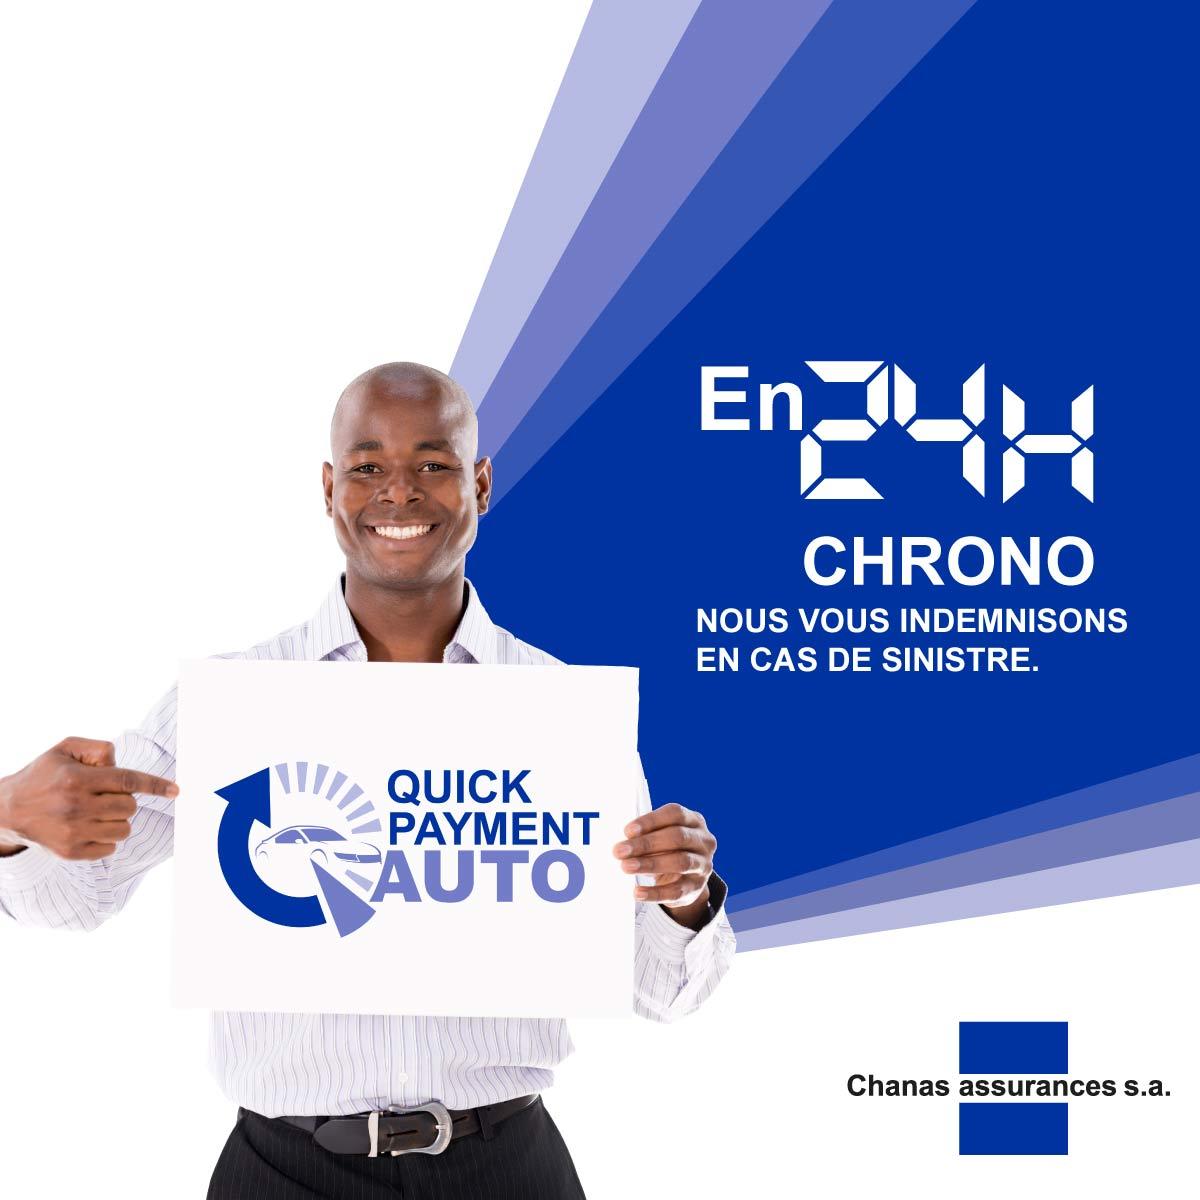 Chanas Assurance Quick Payment Auto